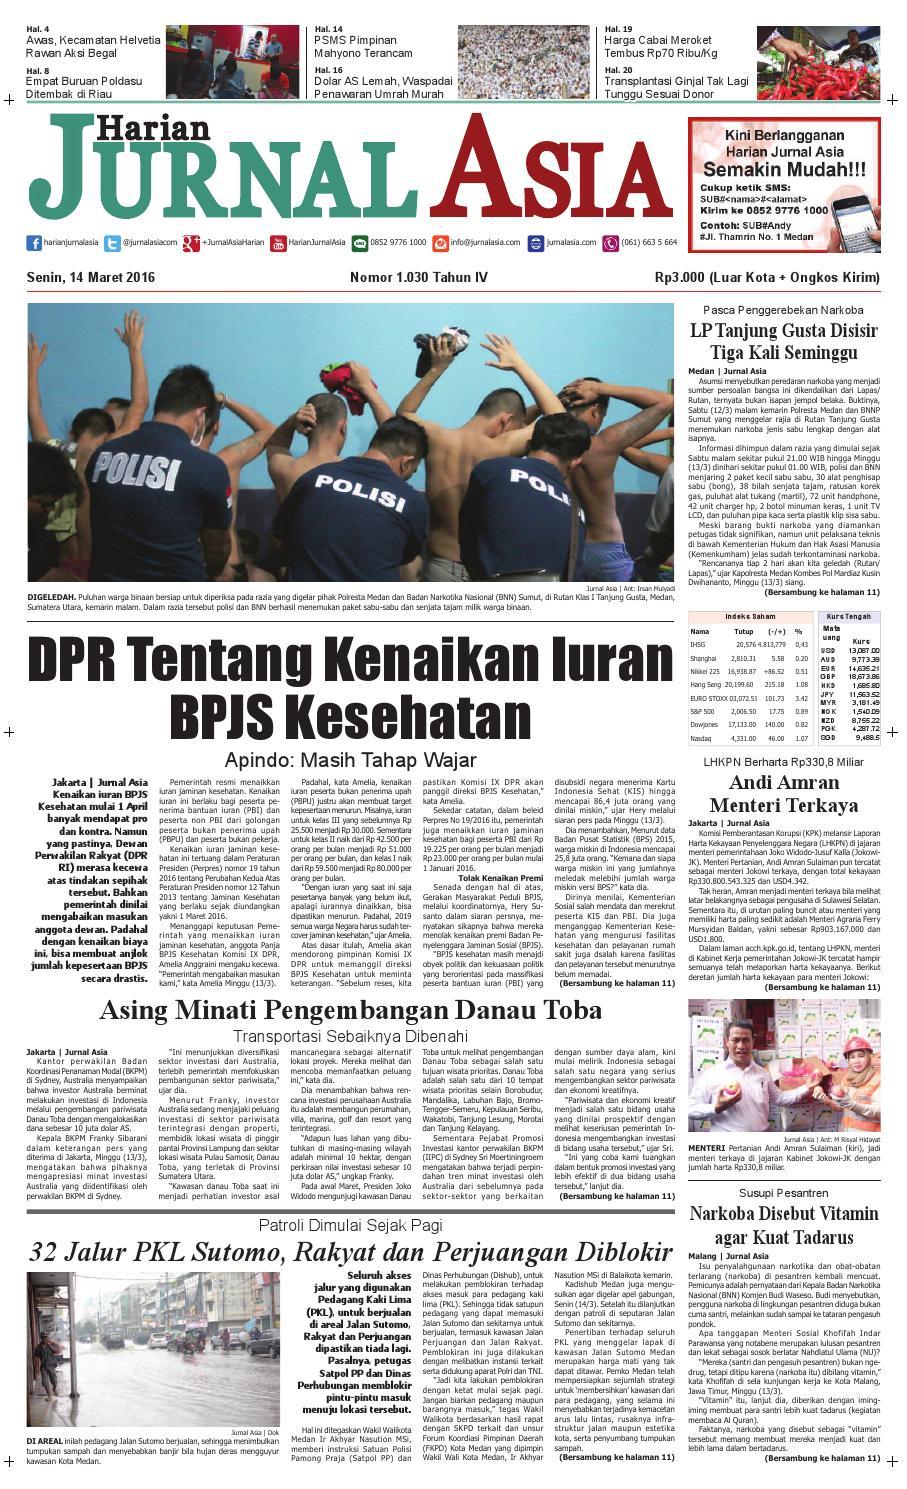 Harian Jurnal Asia Edisi Senin 14 Maret 2016 By Produk Ukm Bumn Rasa Dewa Sari Buah Mbing 250ml Jus Free Ongkir Depok Ampamp Jakarta Medan Issuu